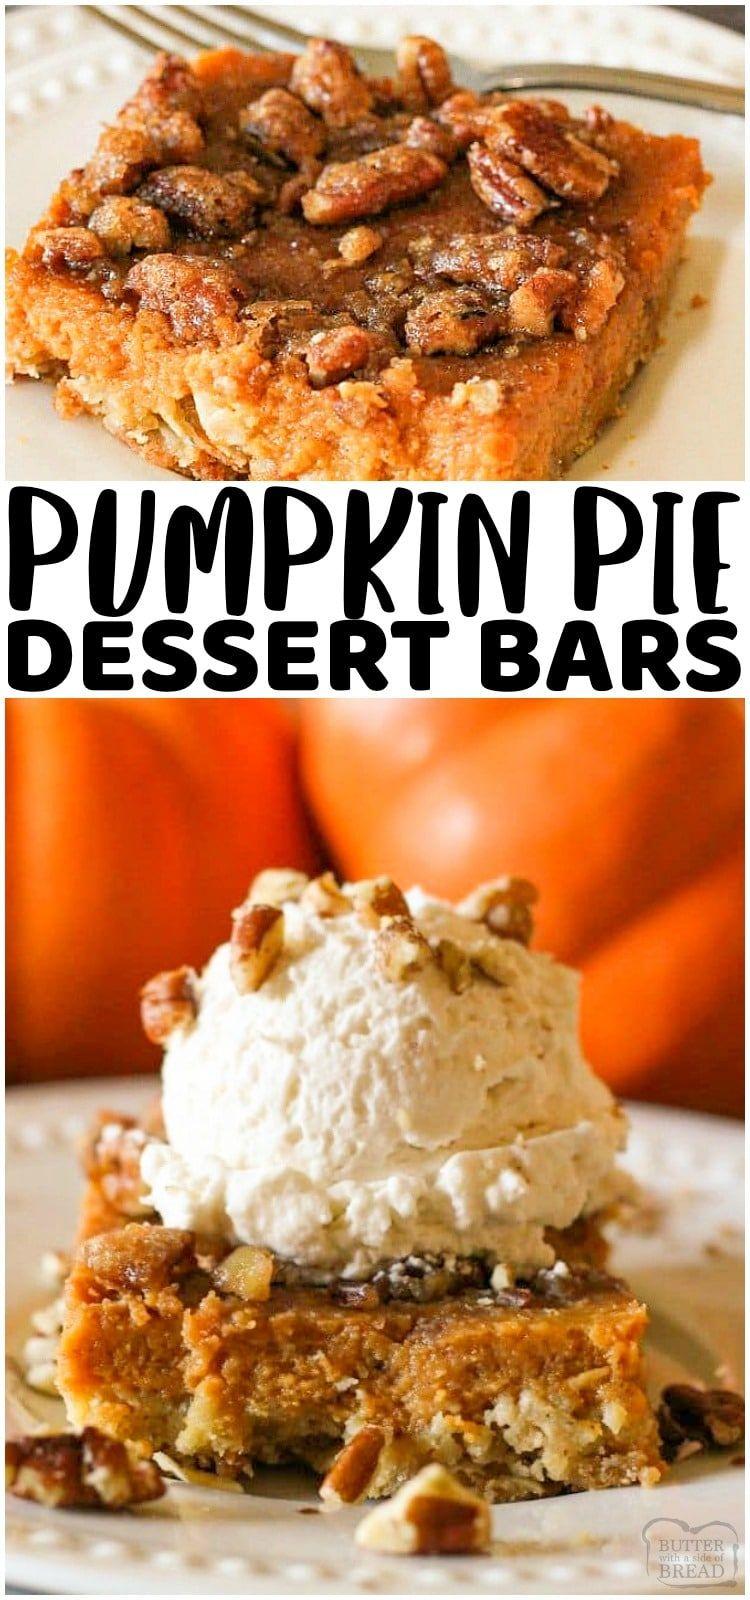 Pumpkin Pie Bars Pumpkin Pie Bars Best Pumpkin Pie Recipe Pumpkin Pie Bars Recipe